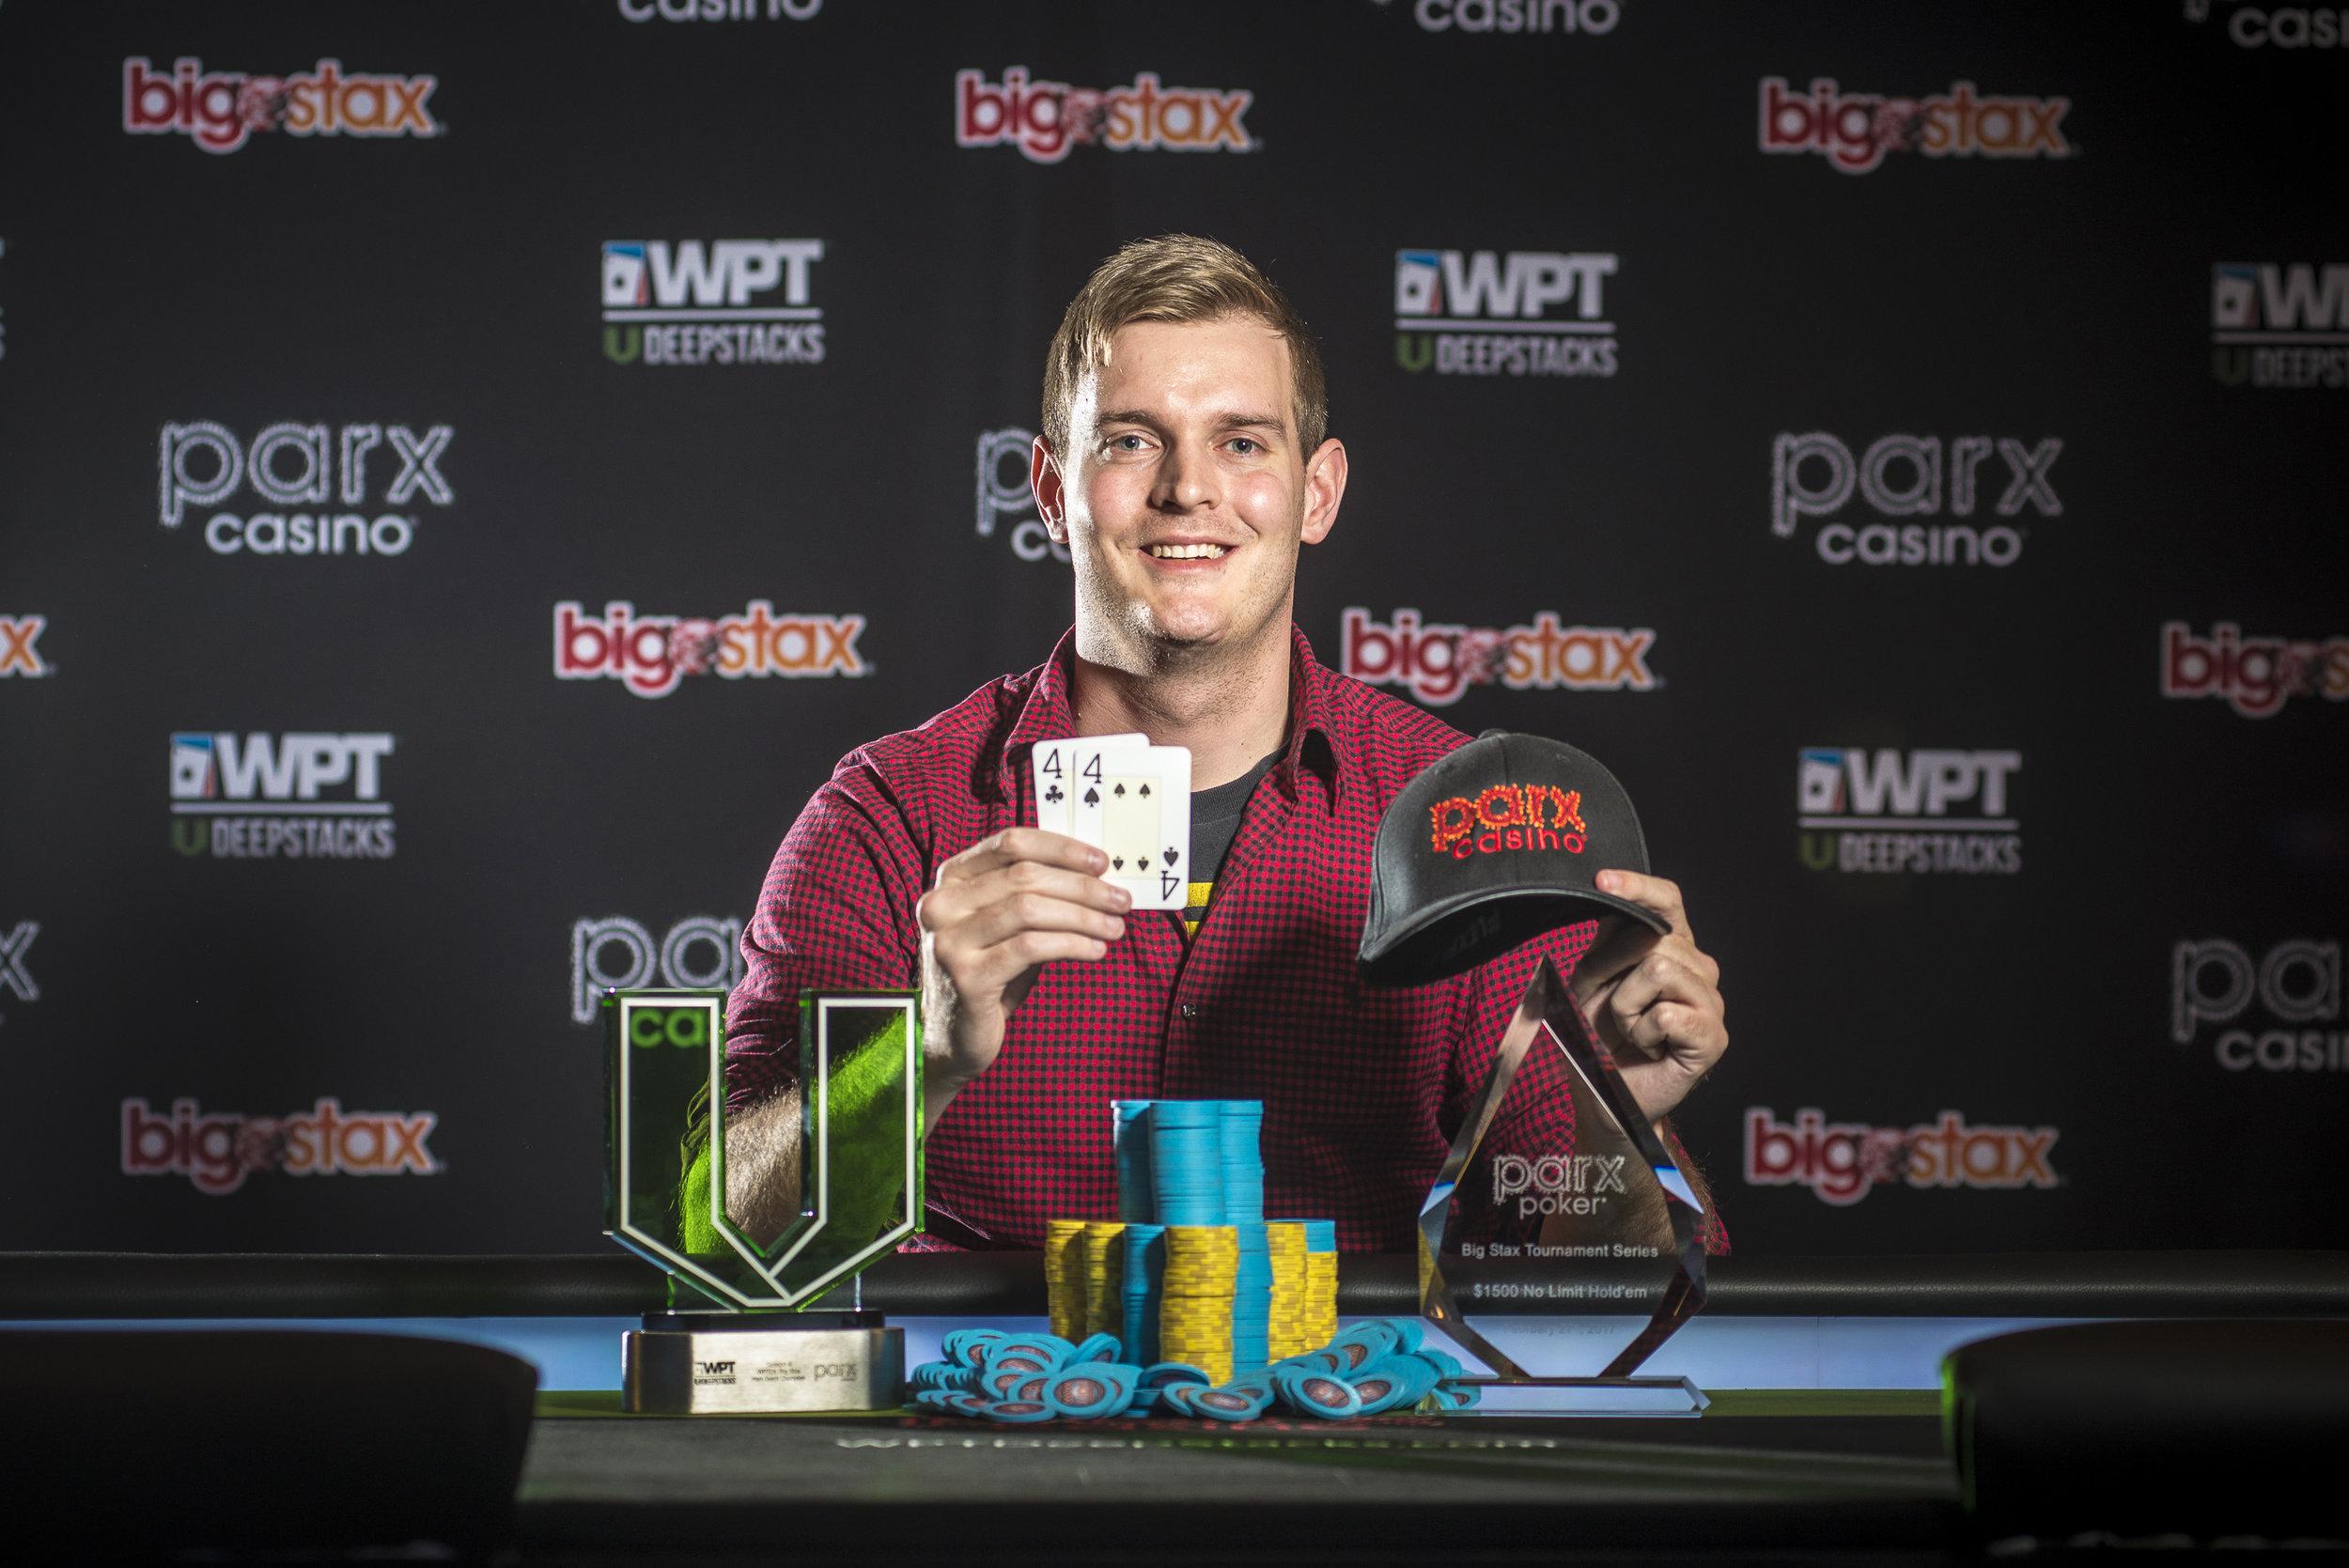 WPTDeepStacks_Jimmy Poper Wins WPTDS Big Stax XX_Amato_AA47347.jpg